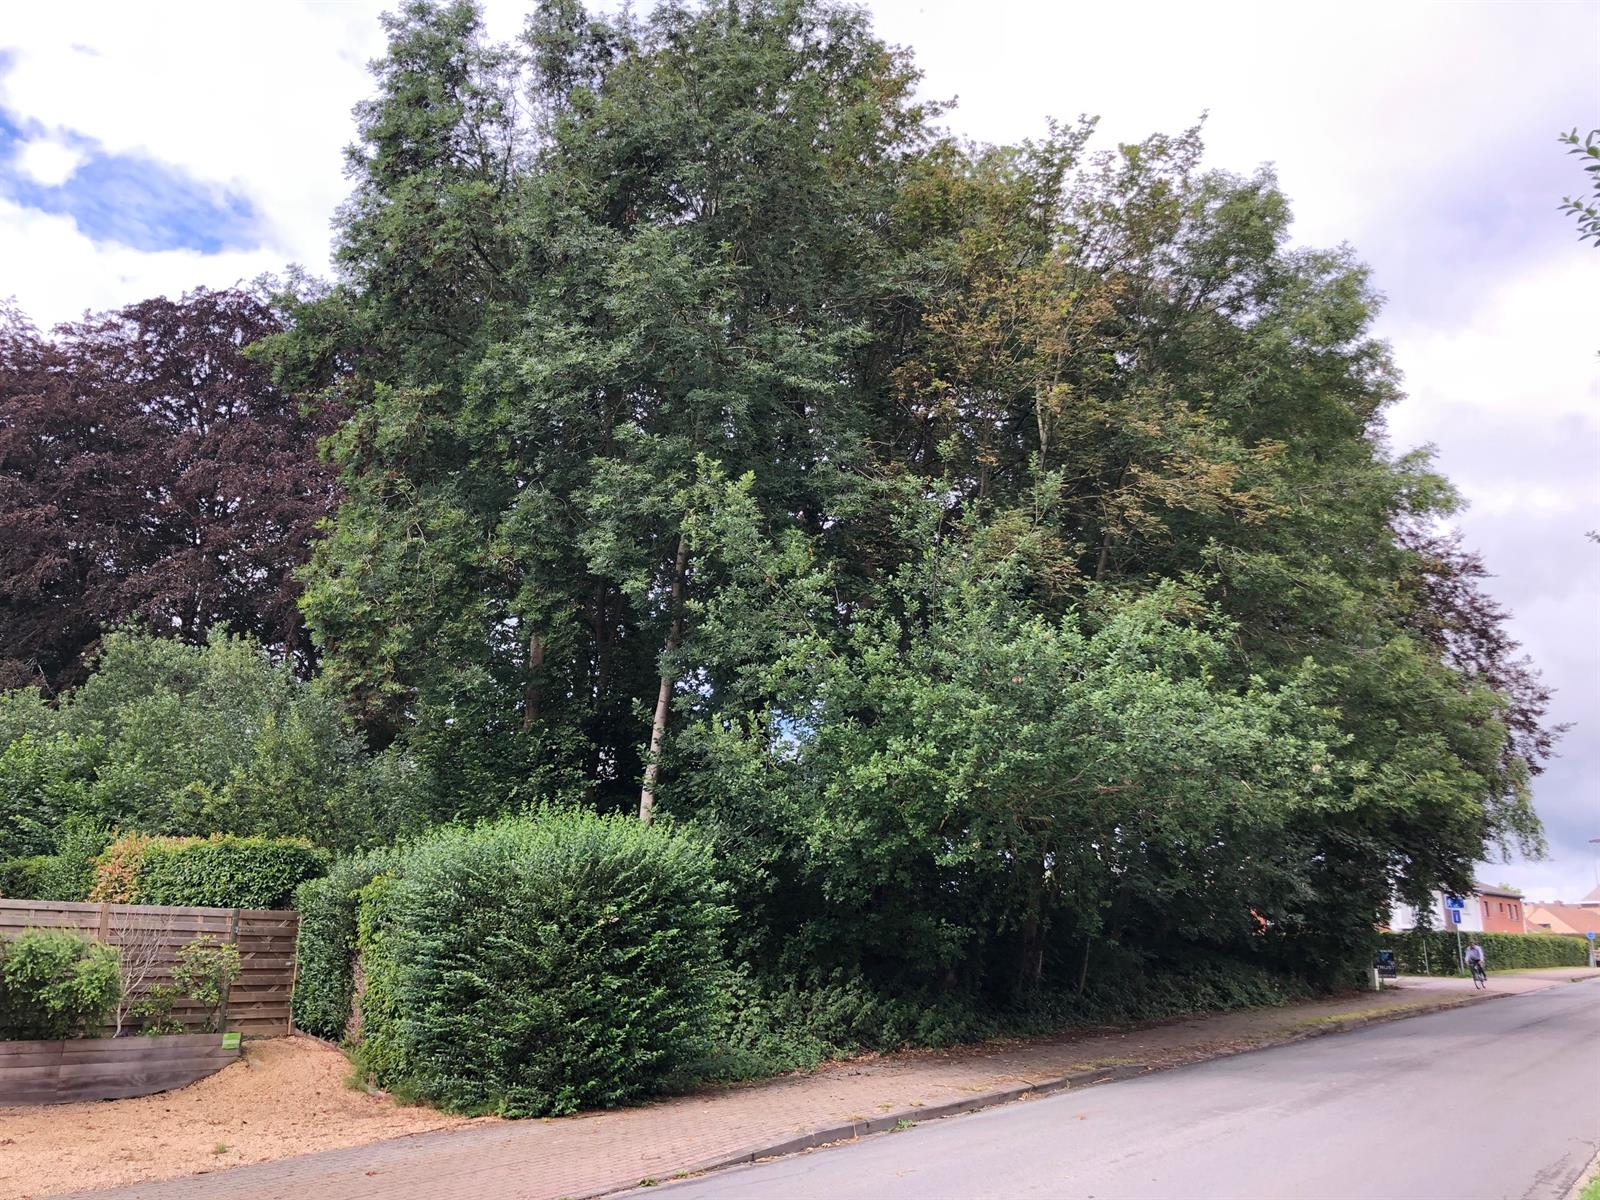 Terrain à bâtir - Ottignies-Louvain-la-Neuve - #4092046-5